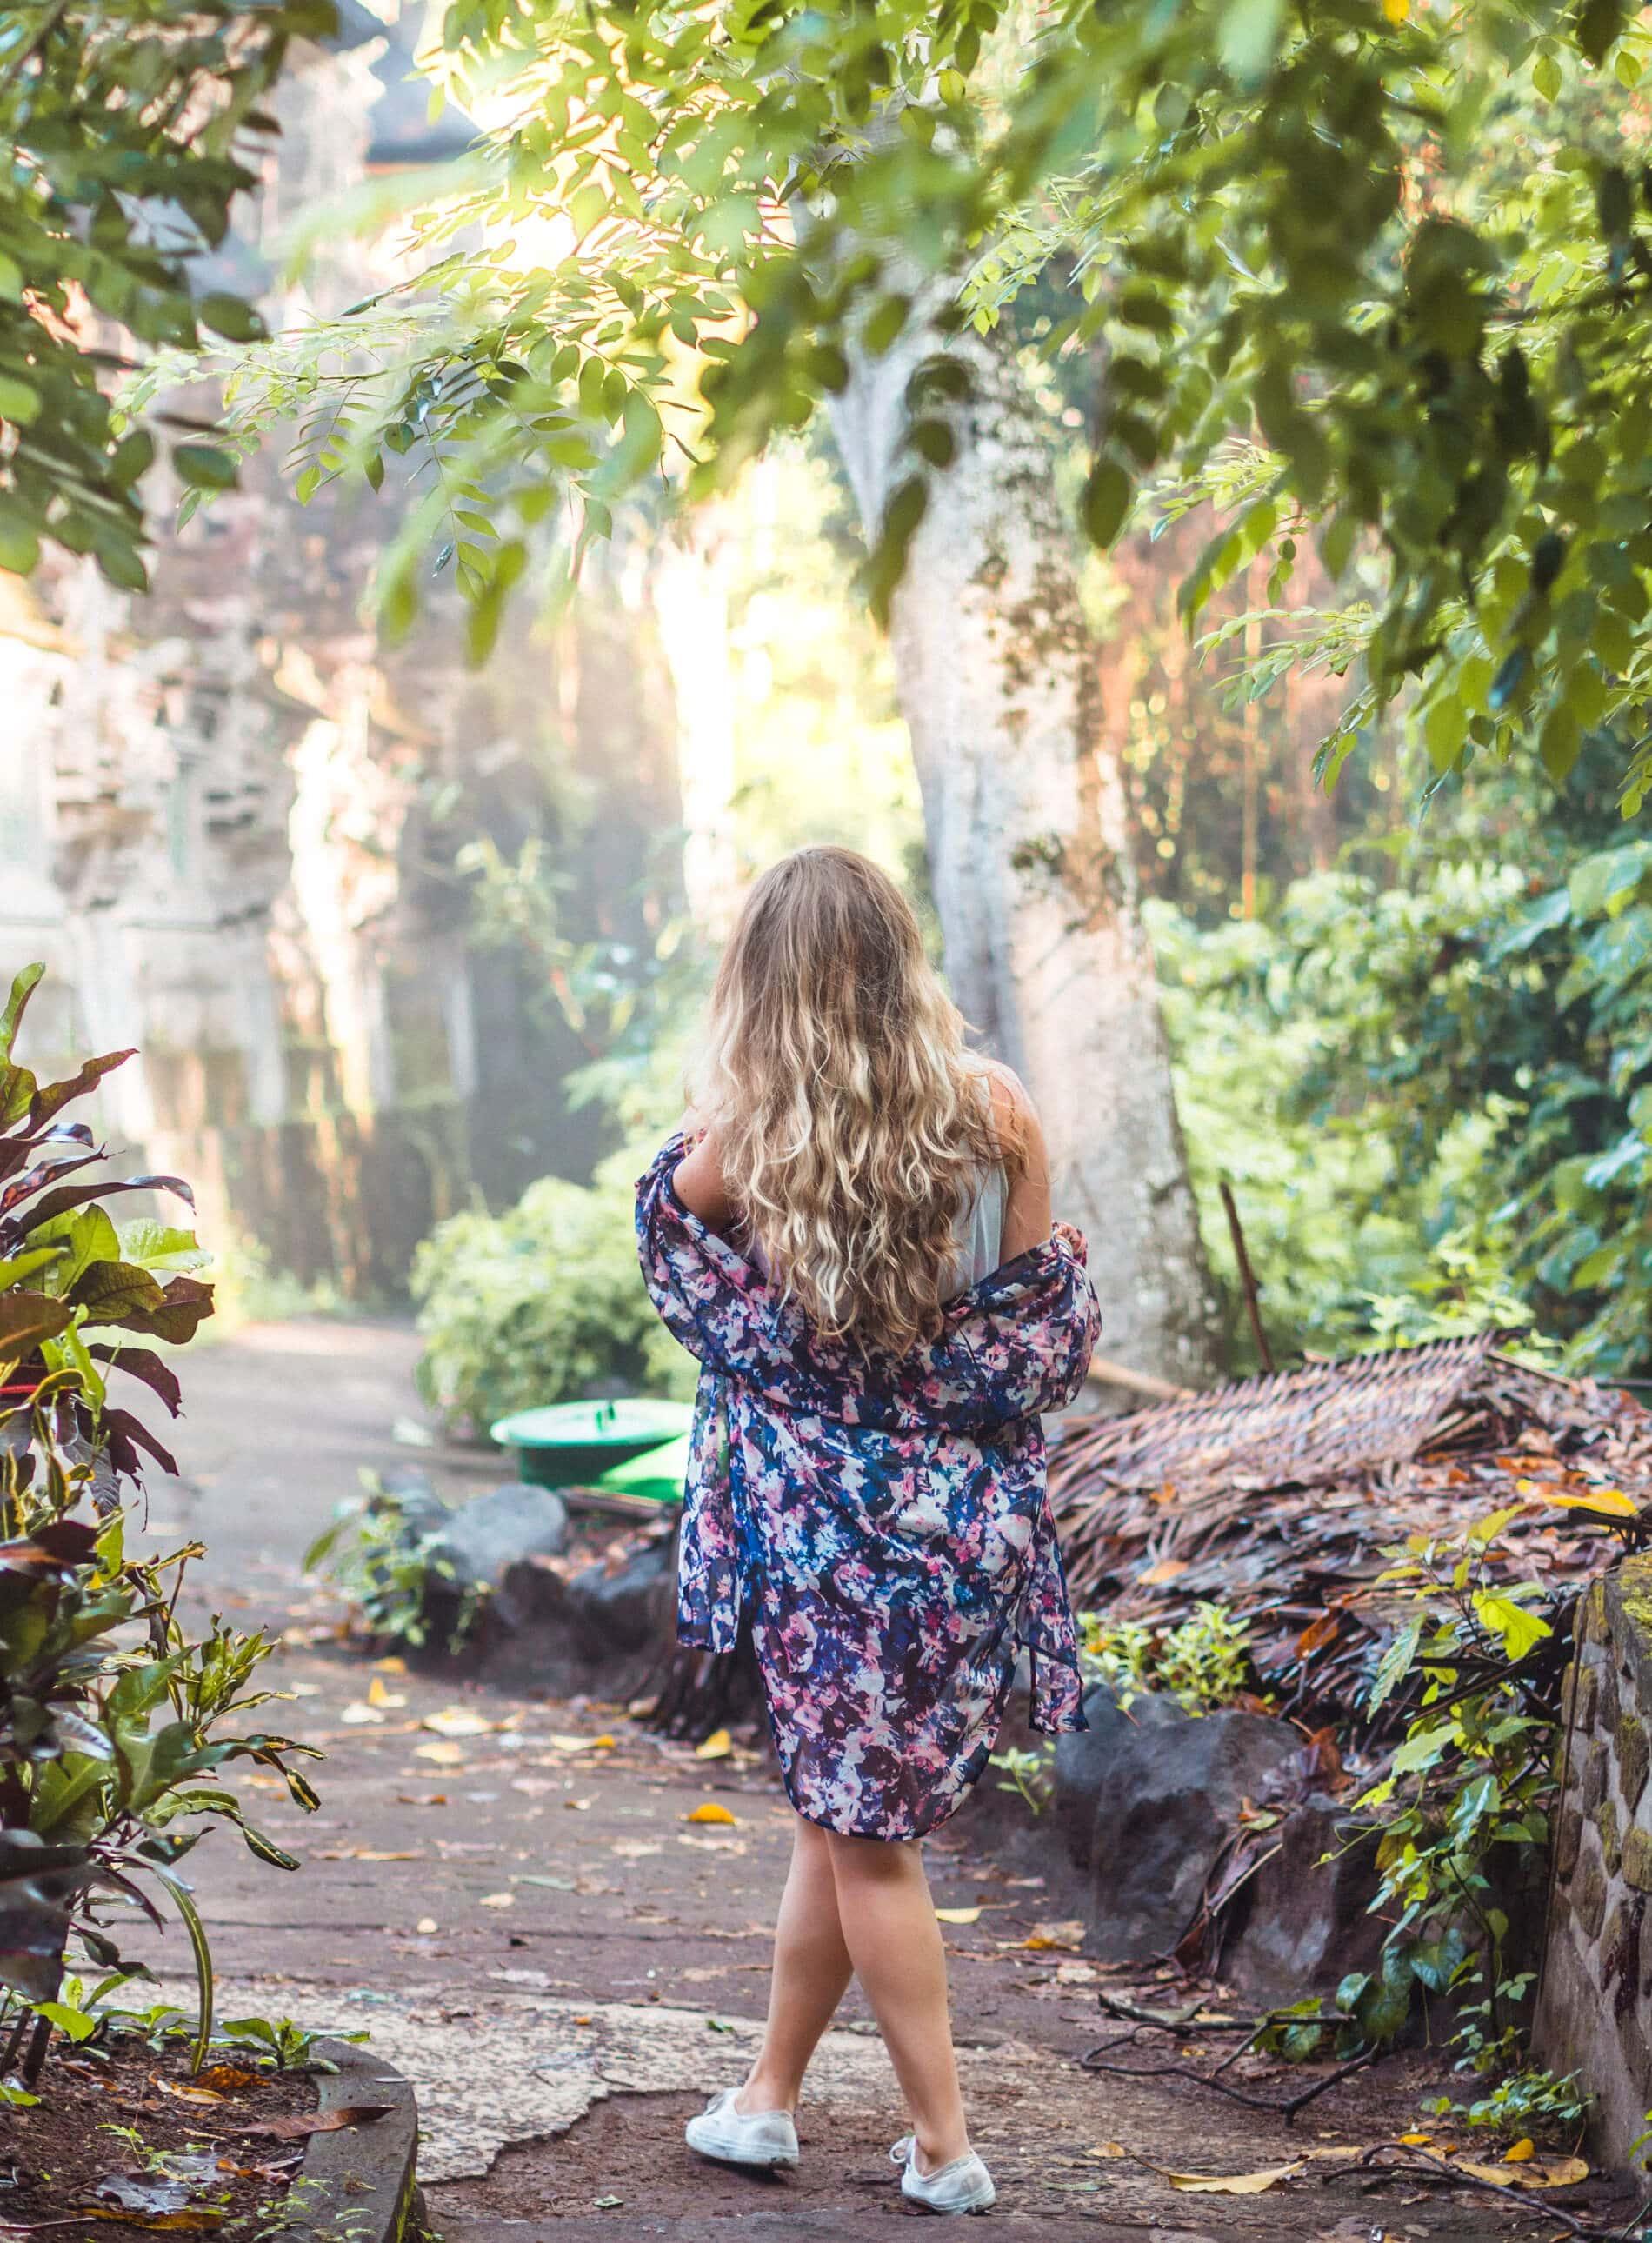 Campuhan Ridge Walk in Ubud - The ultimate Bali Bucket List 2018